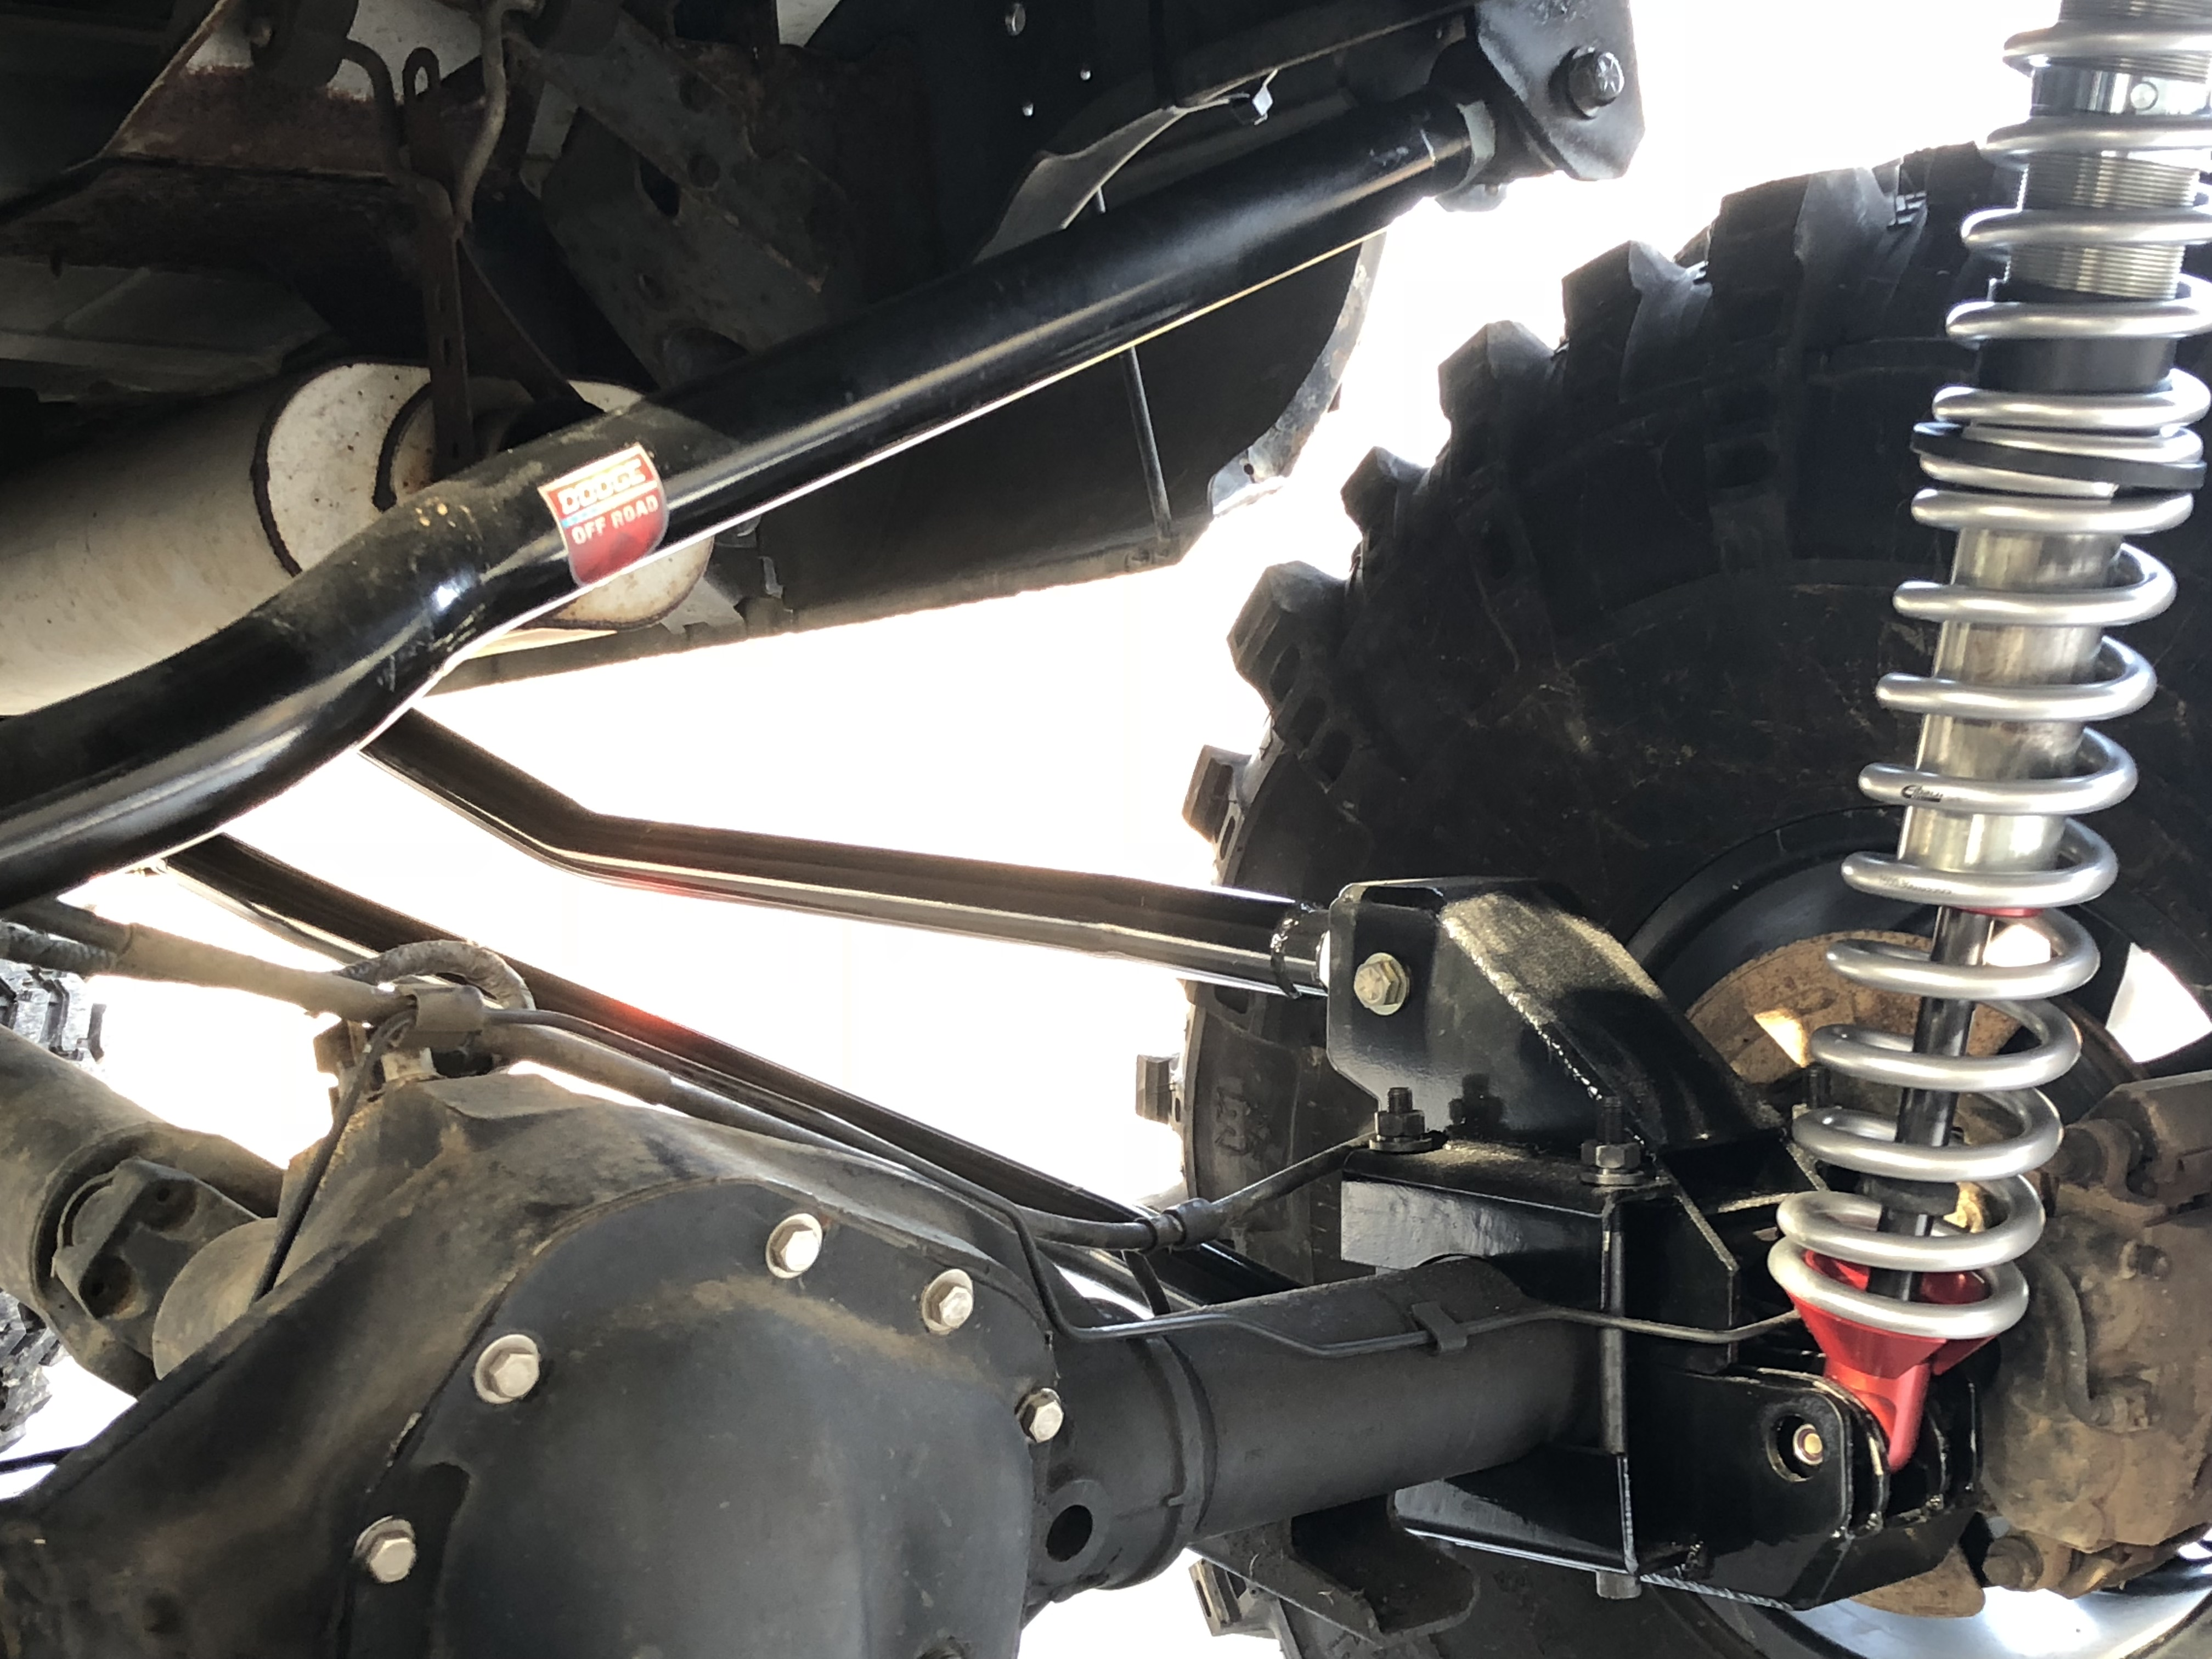 2019 Chevy 3/4 Ton Truck | 2019 - 2020 GM Car Models - Part 4